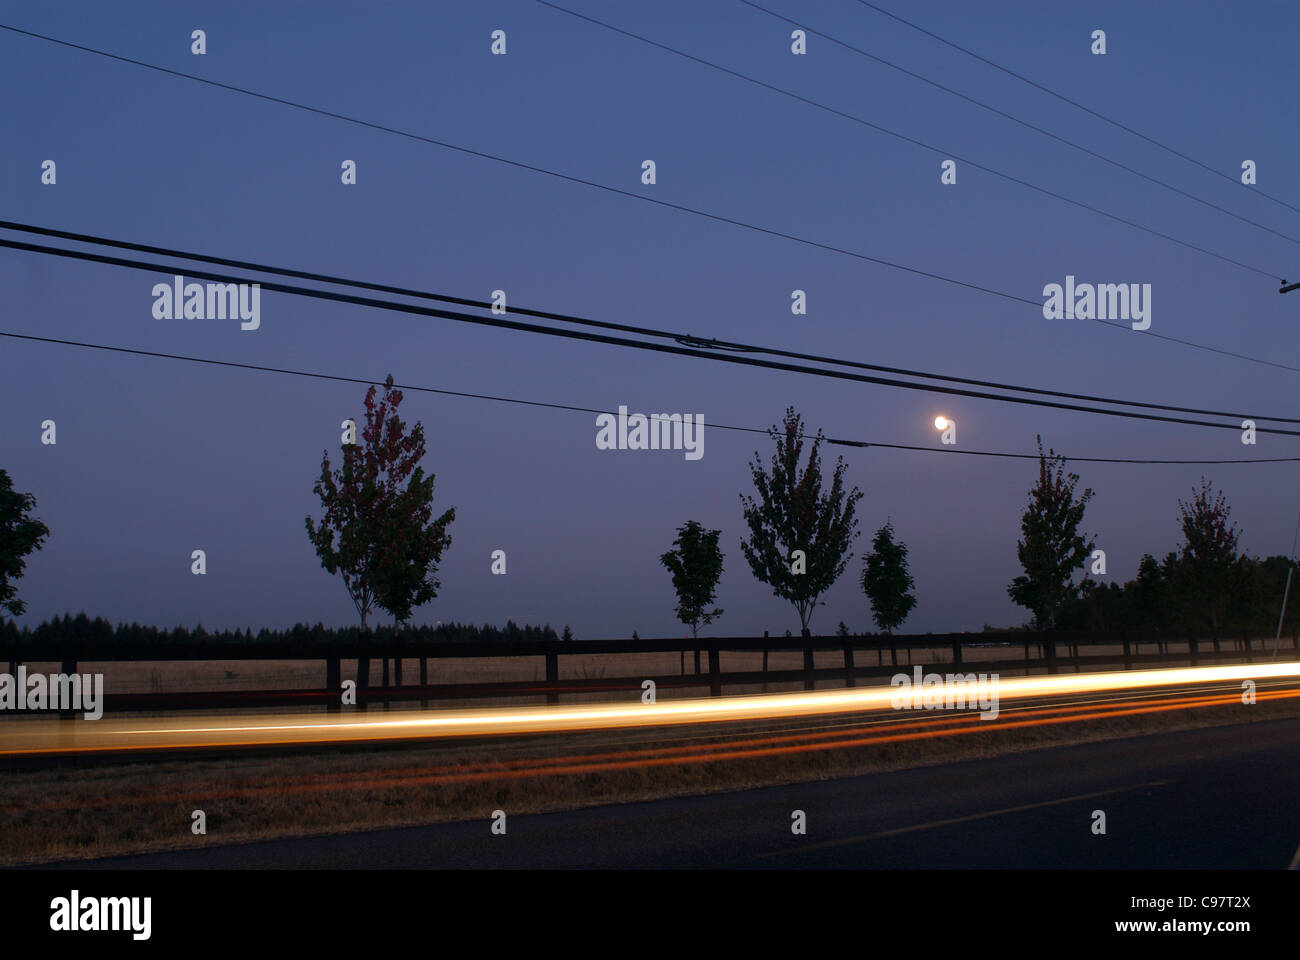 Electrical Cars Stockfotos & Electrical Cars Bilder - Seite 18 - Alamy